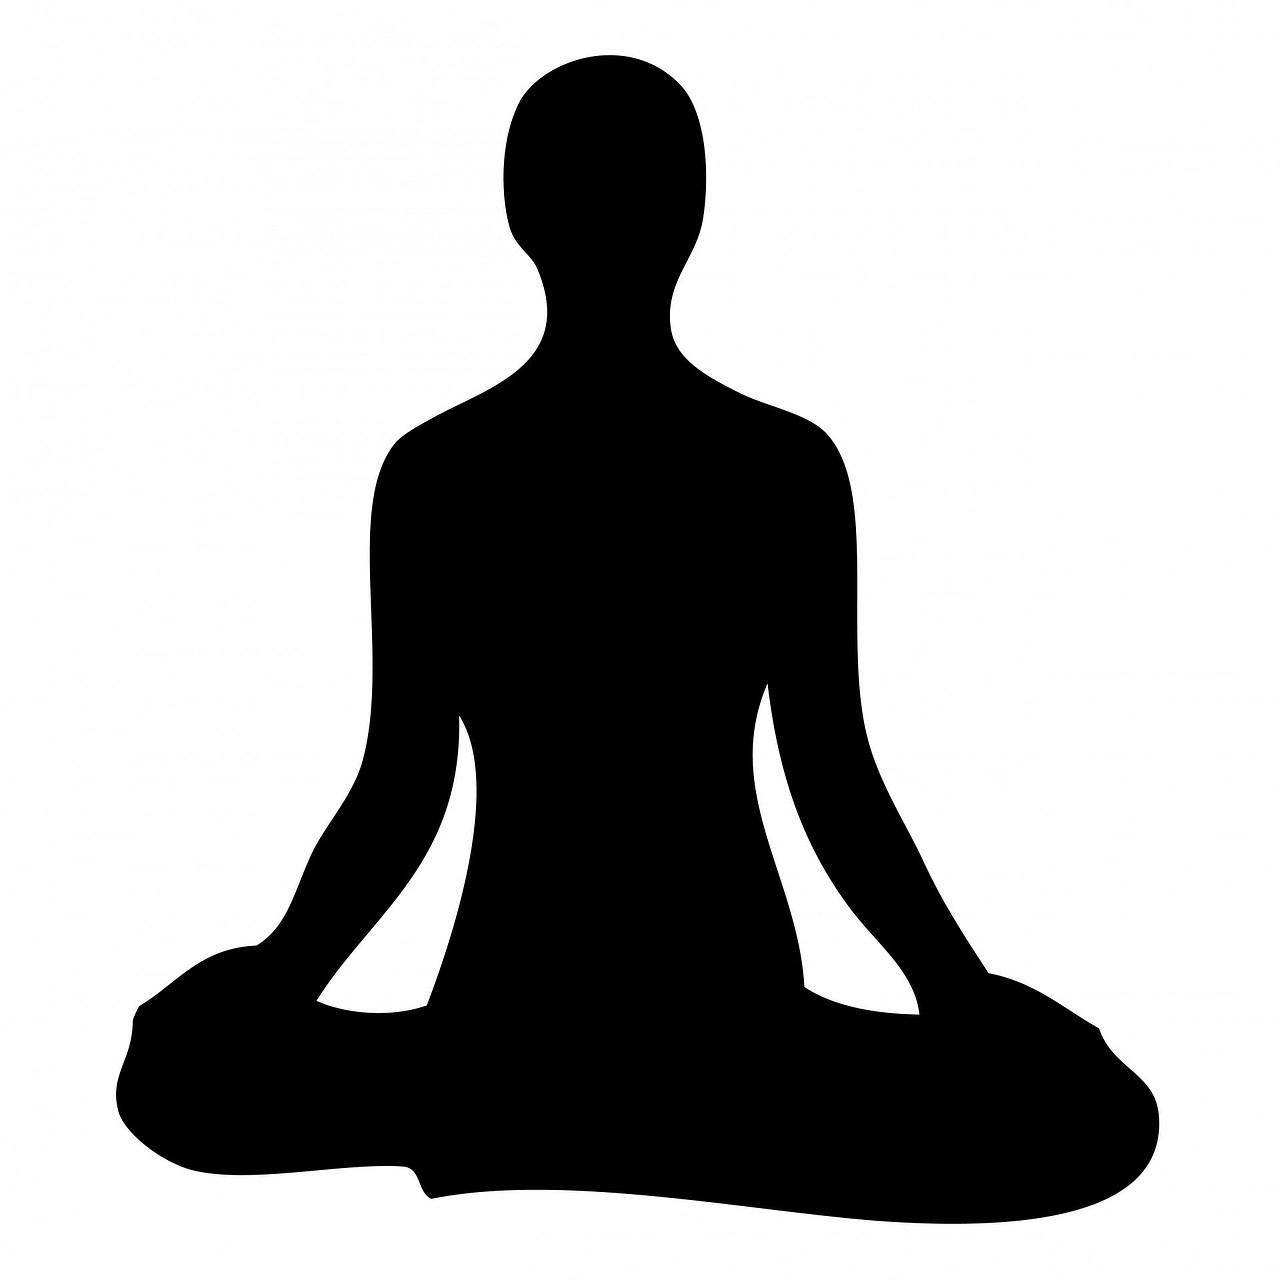 Meditation & Mindfulness.